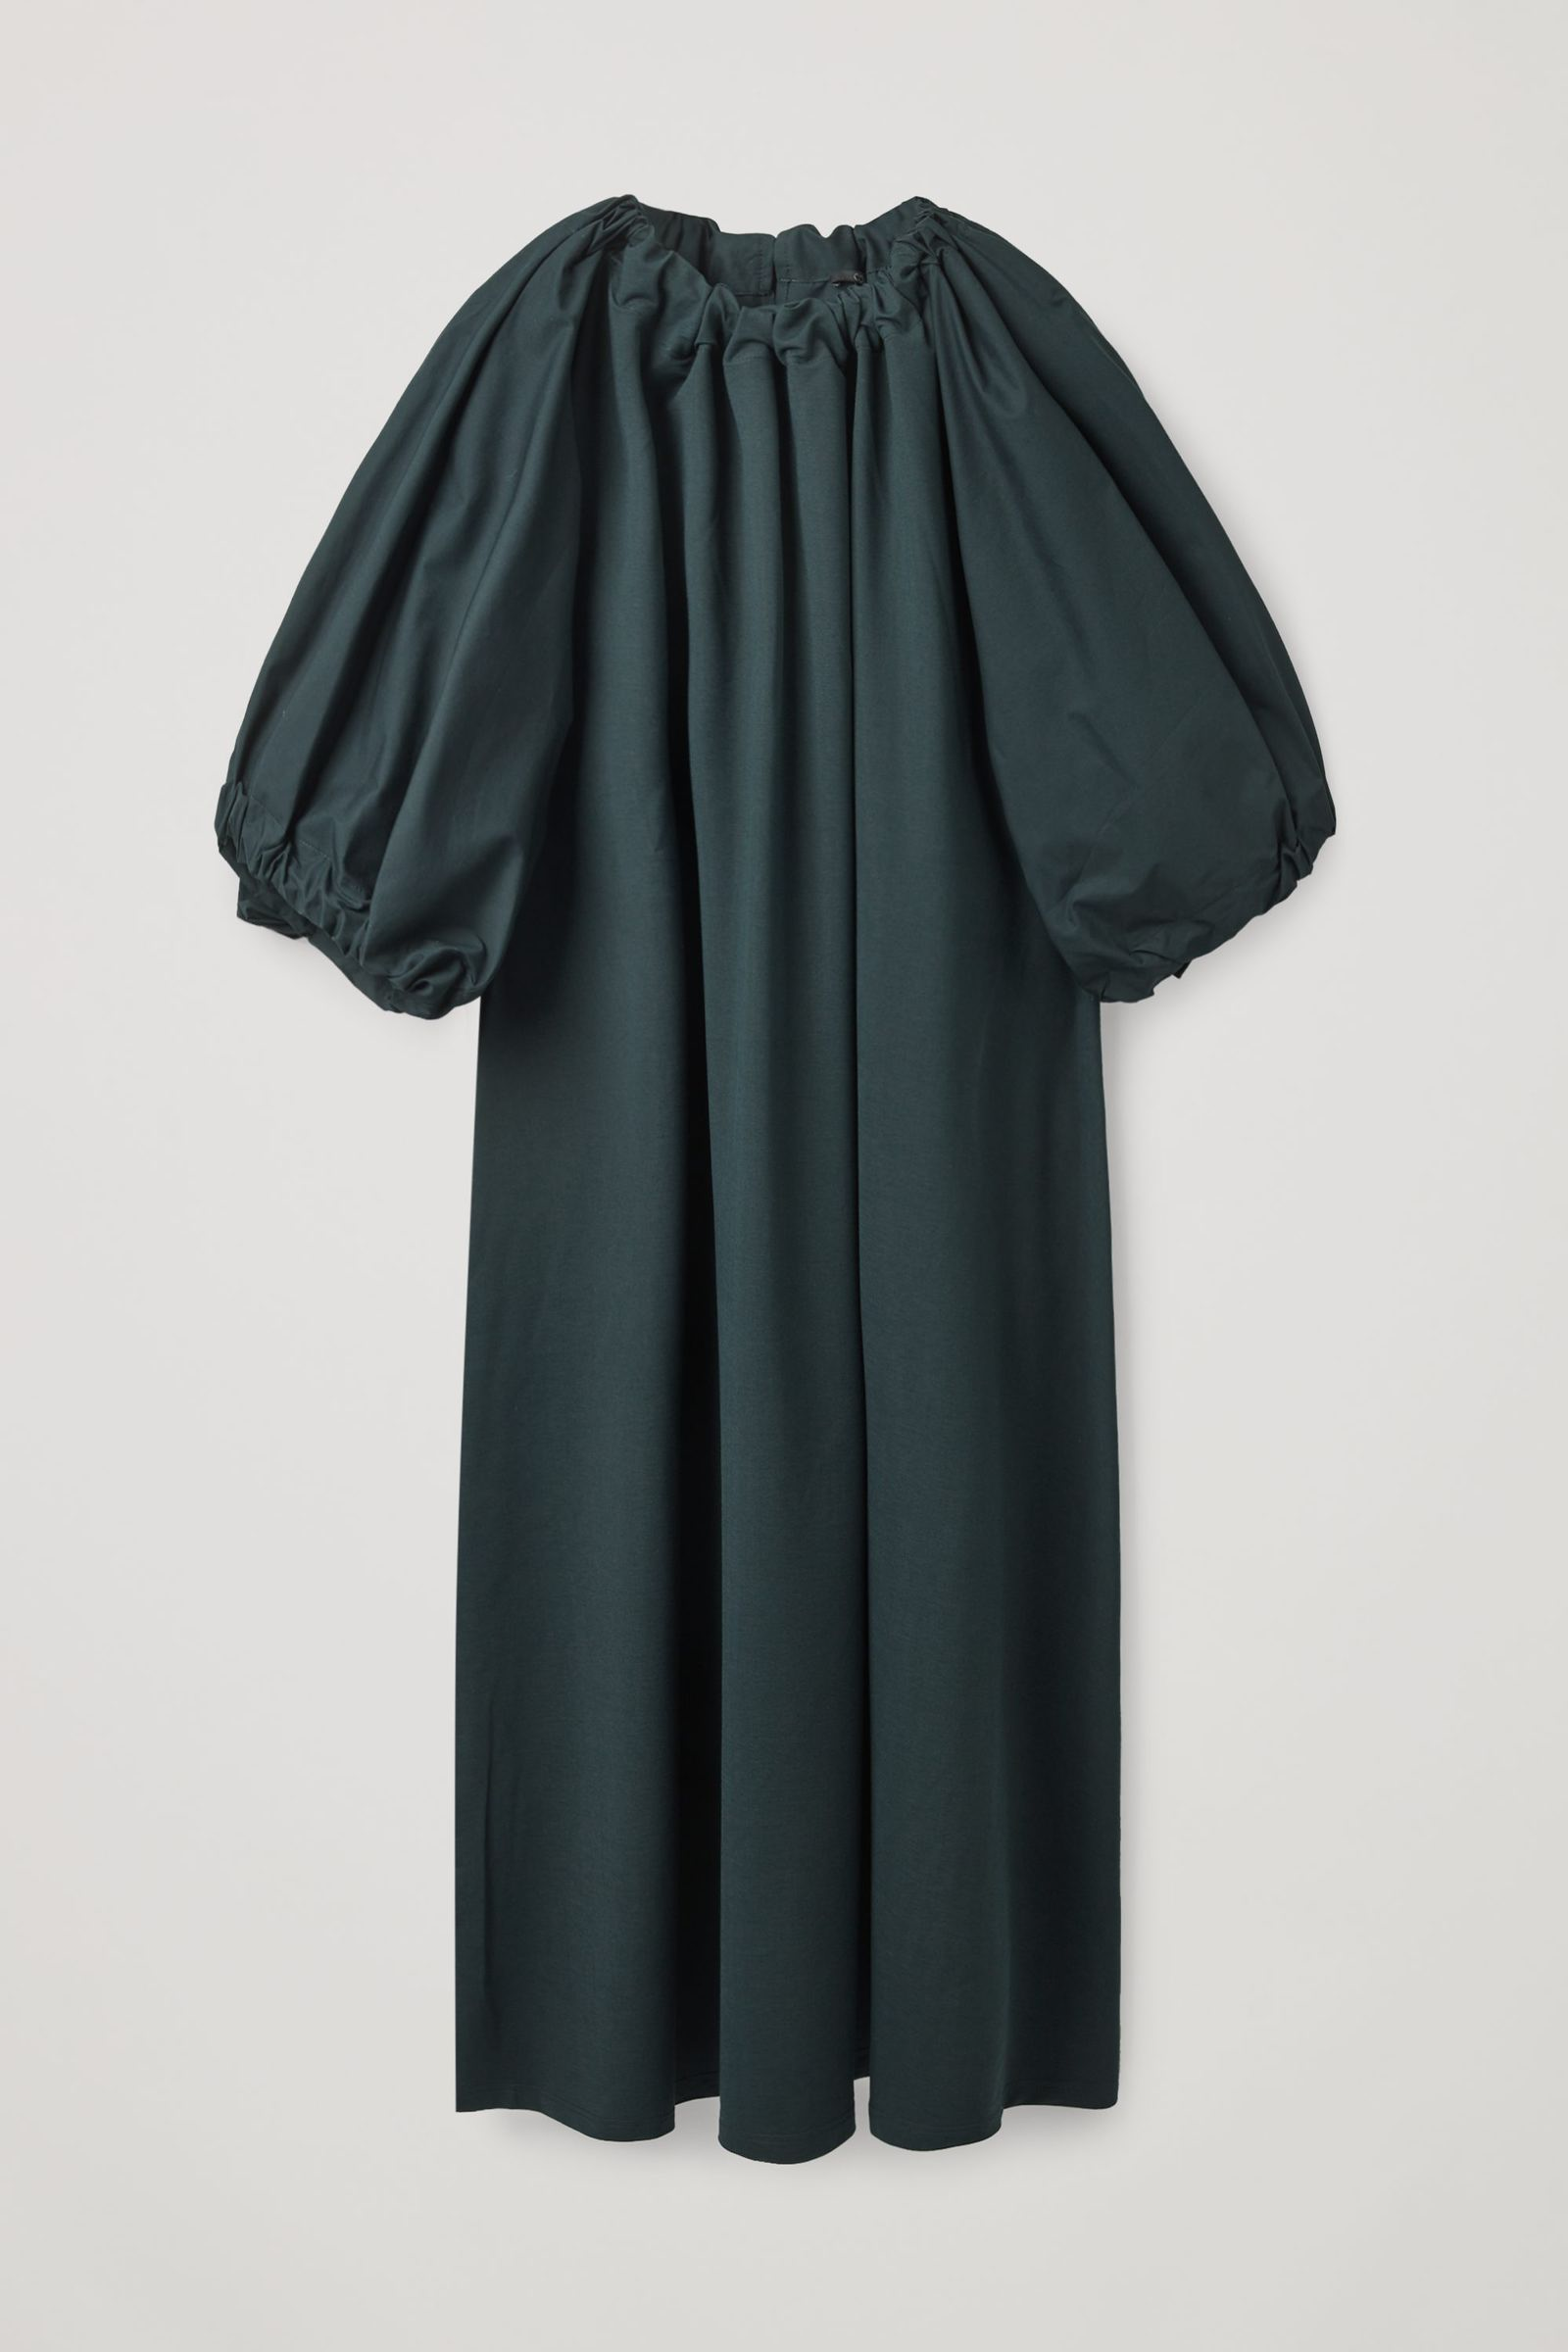 COS 개더드 드레스의 다크 터쿼이즈컬러 Product입니다.